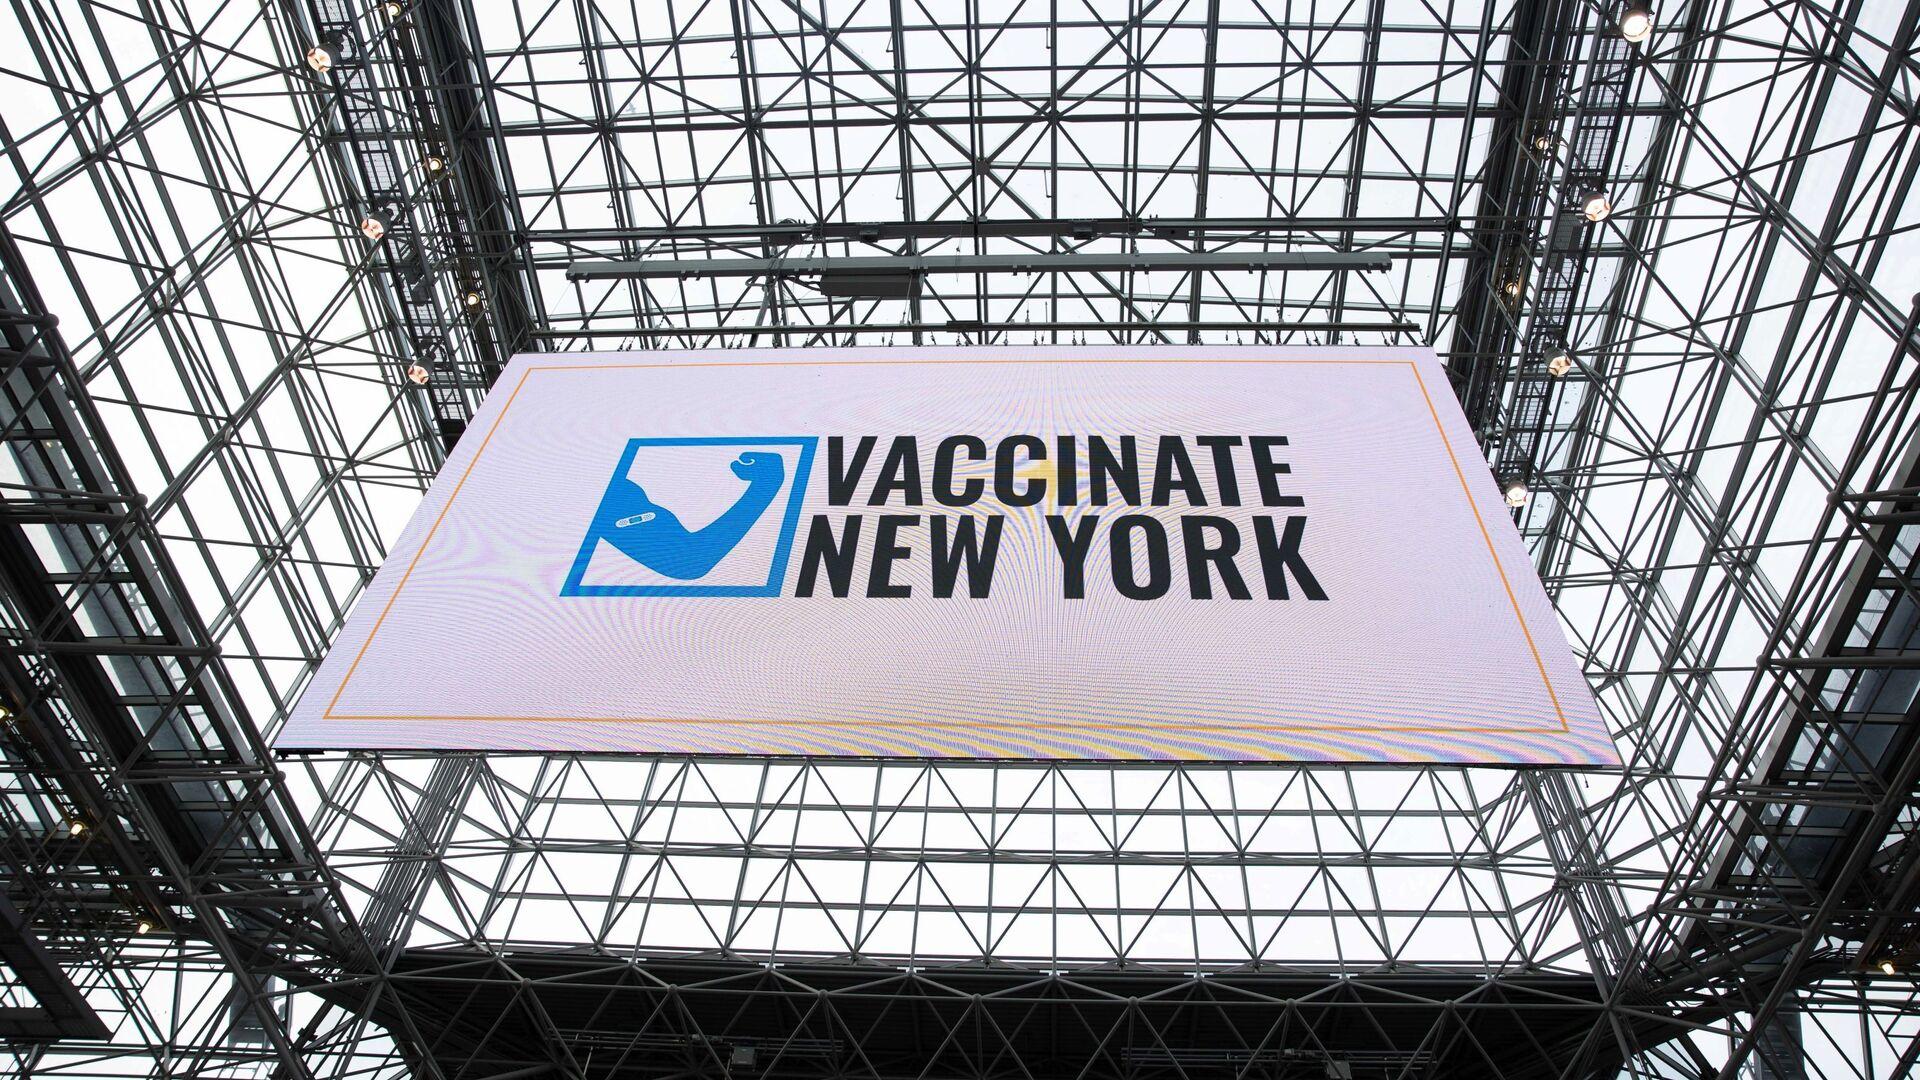 Экран в центре вакцинации от коронавируса на территории конференц-центра Якоба Явица в Нью-Йорке  - Sputnik Česká republika, 1920, 03.08.2021